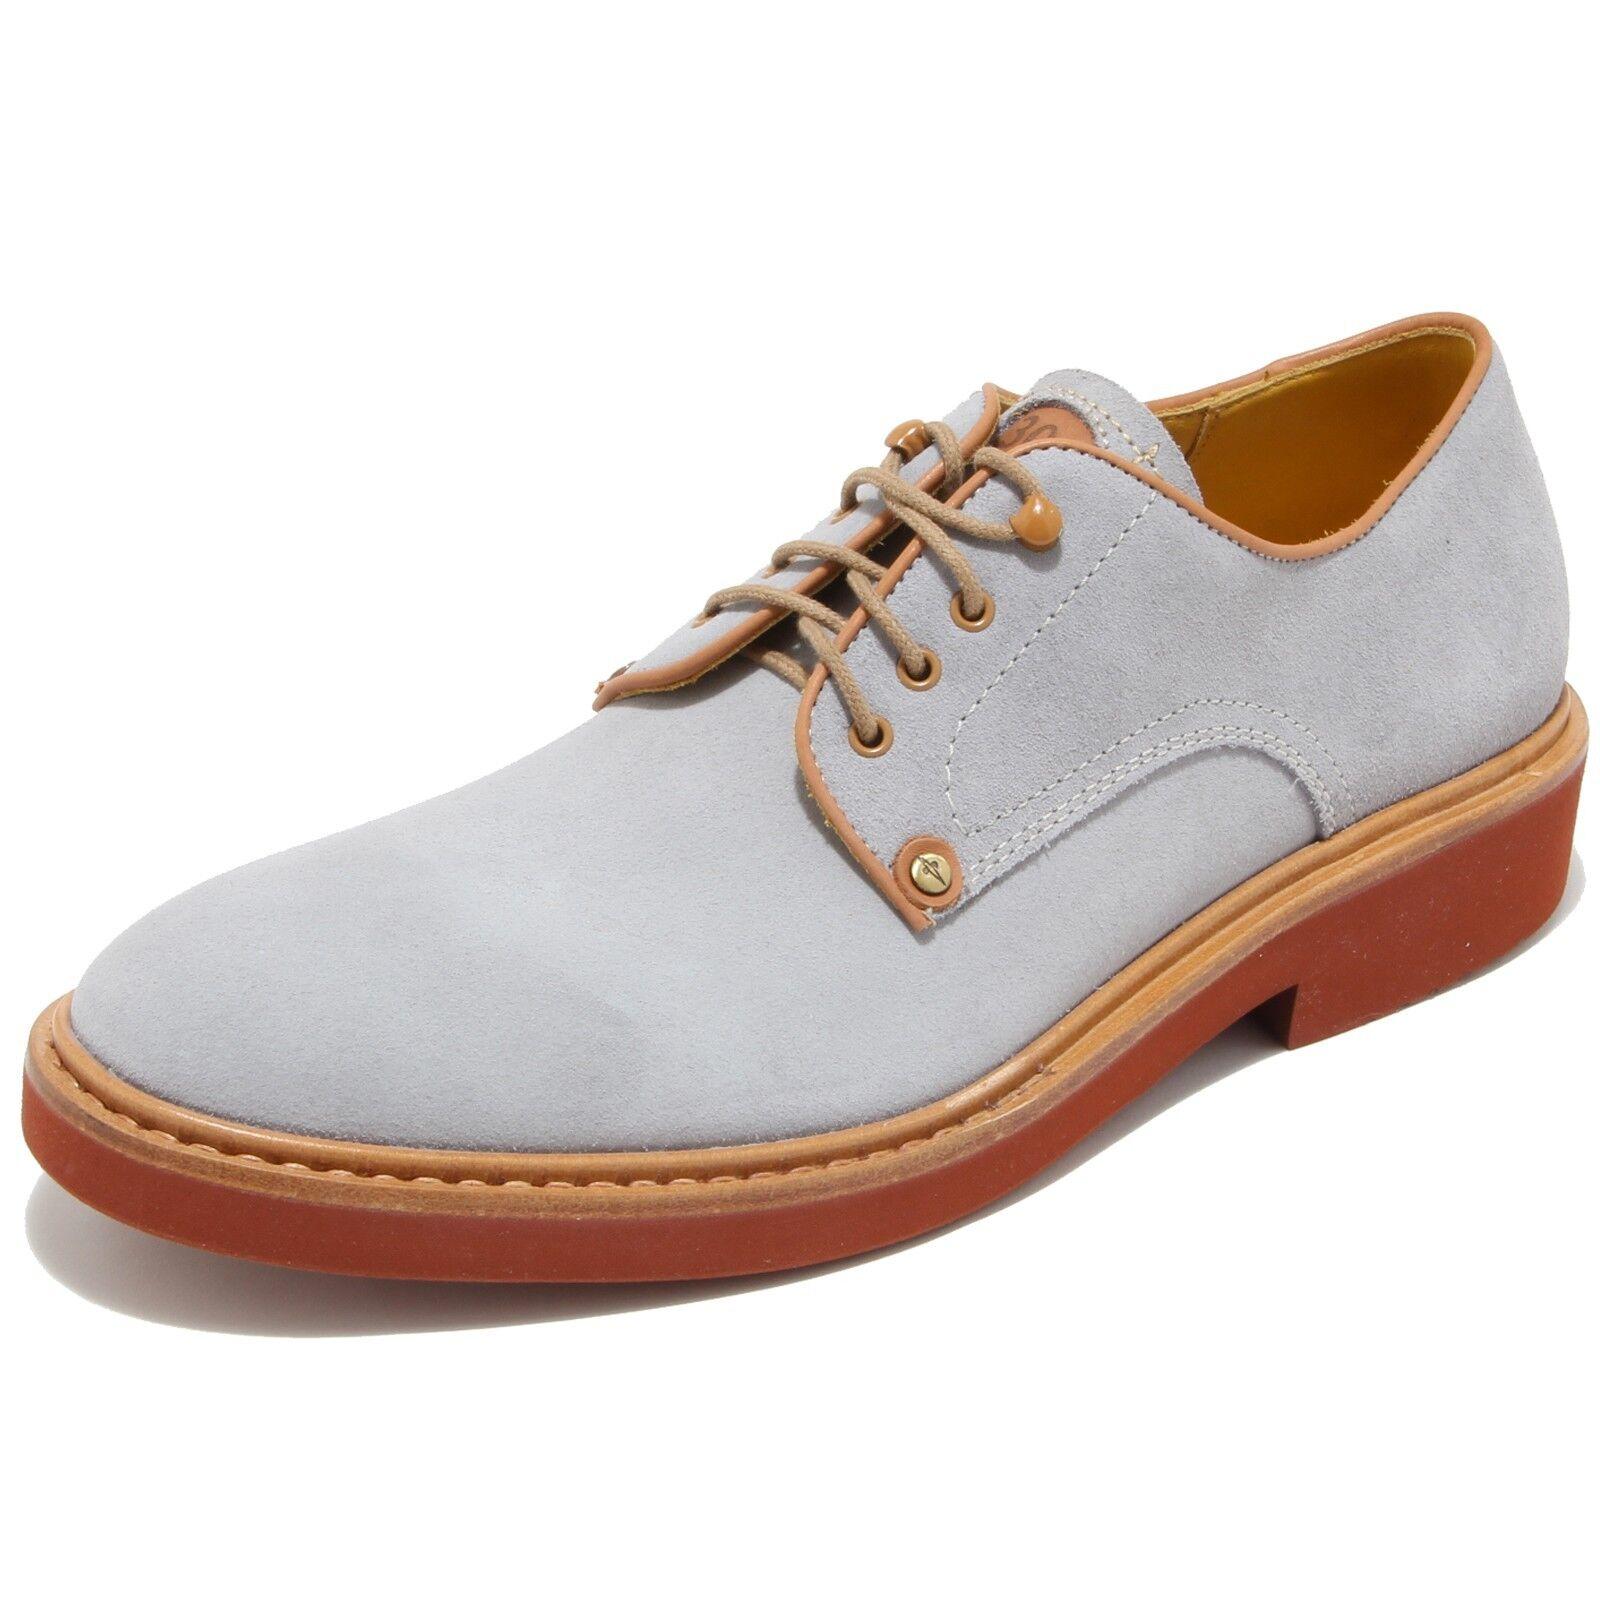 8752I scarpe uomo CESARE PACIOTTI 308 MADISON scarpa shoes men